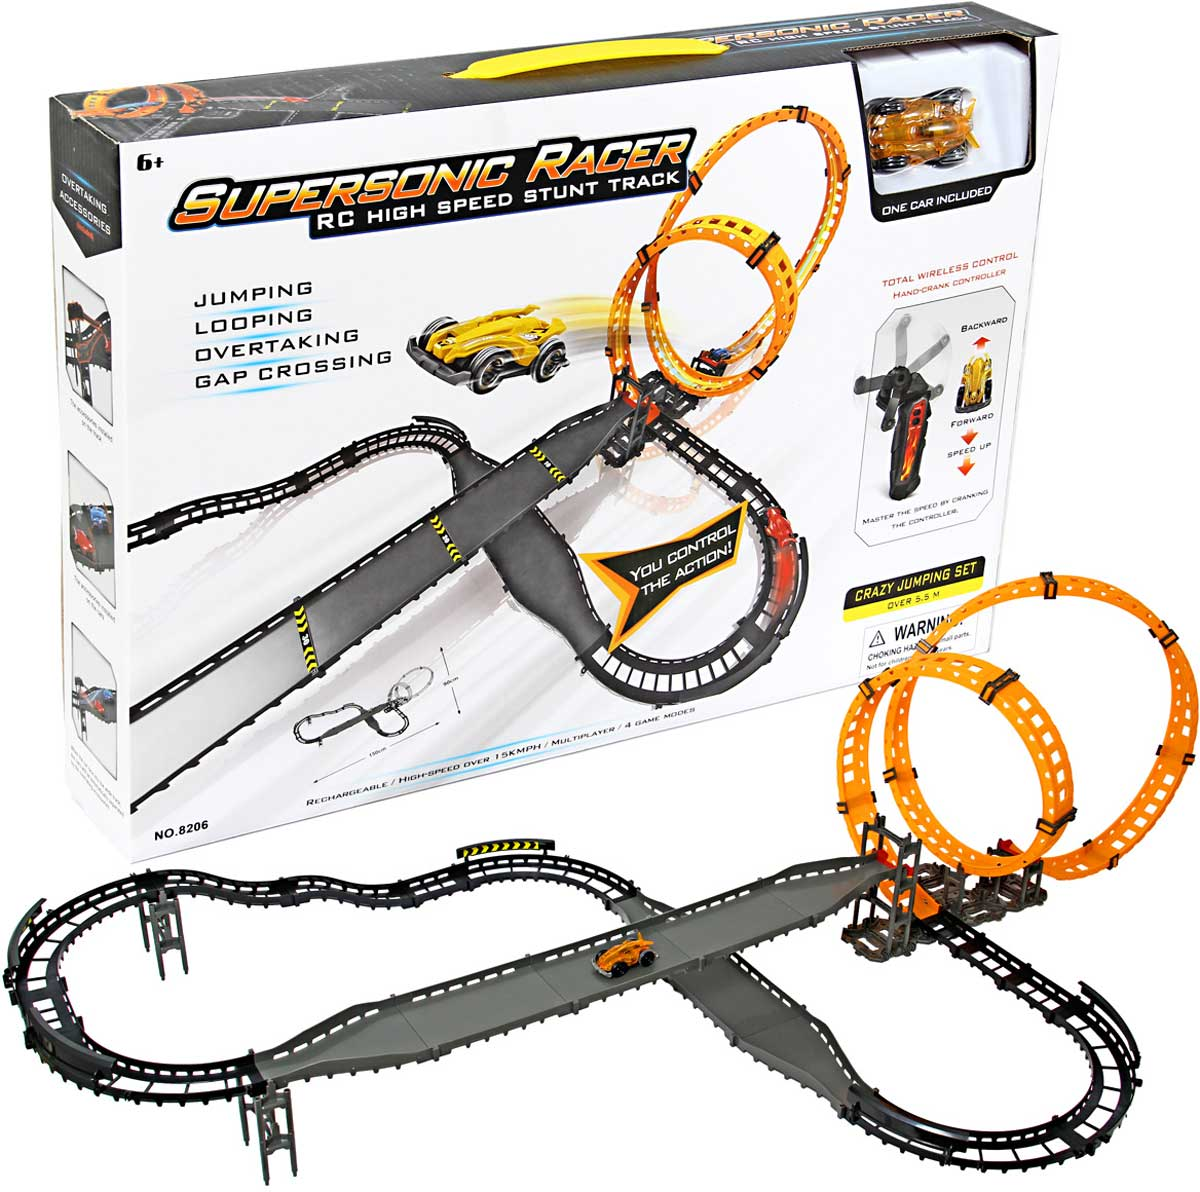 Veld-Co Трек Supersonic Racer цвет серый оранжевый